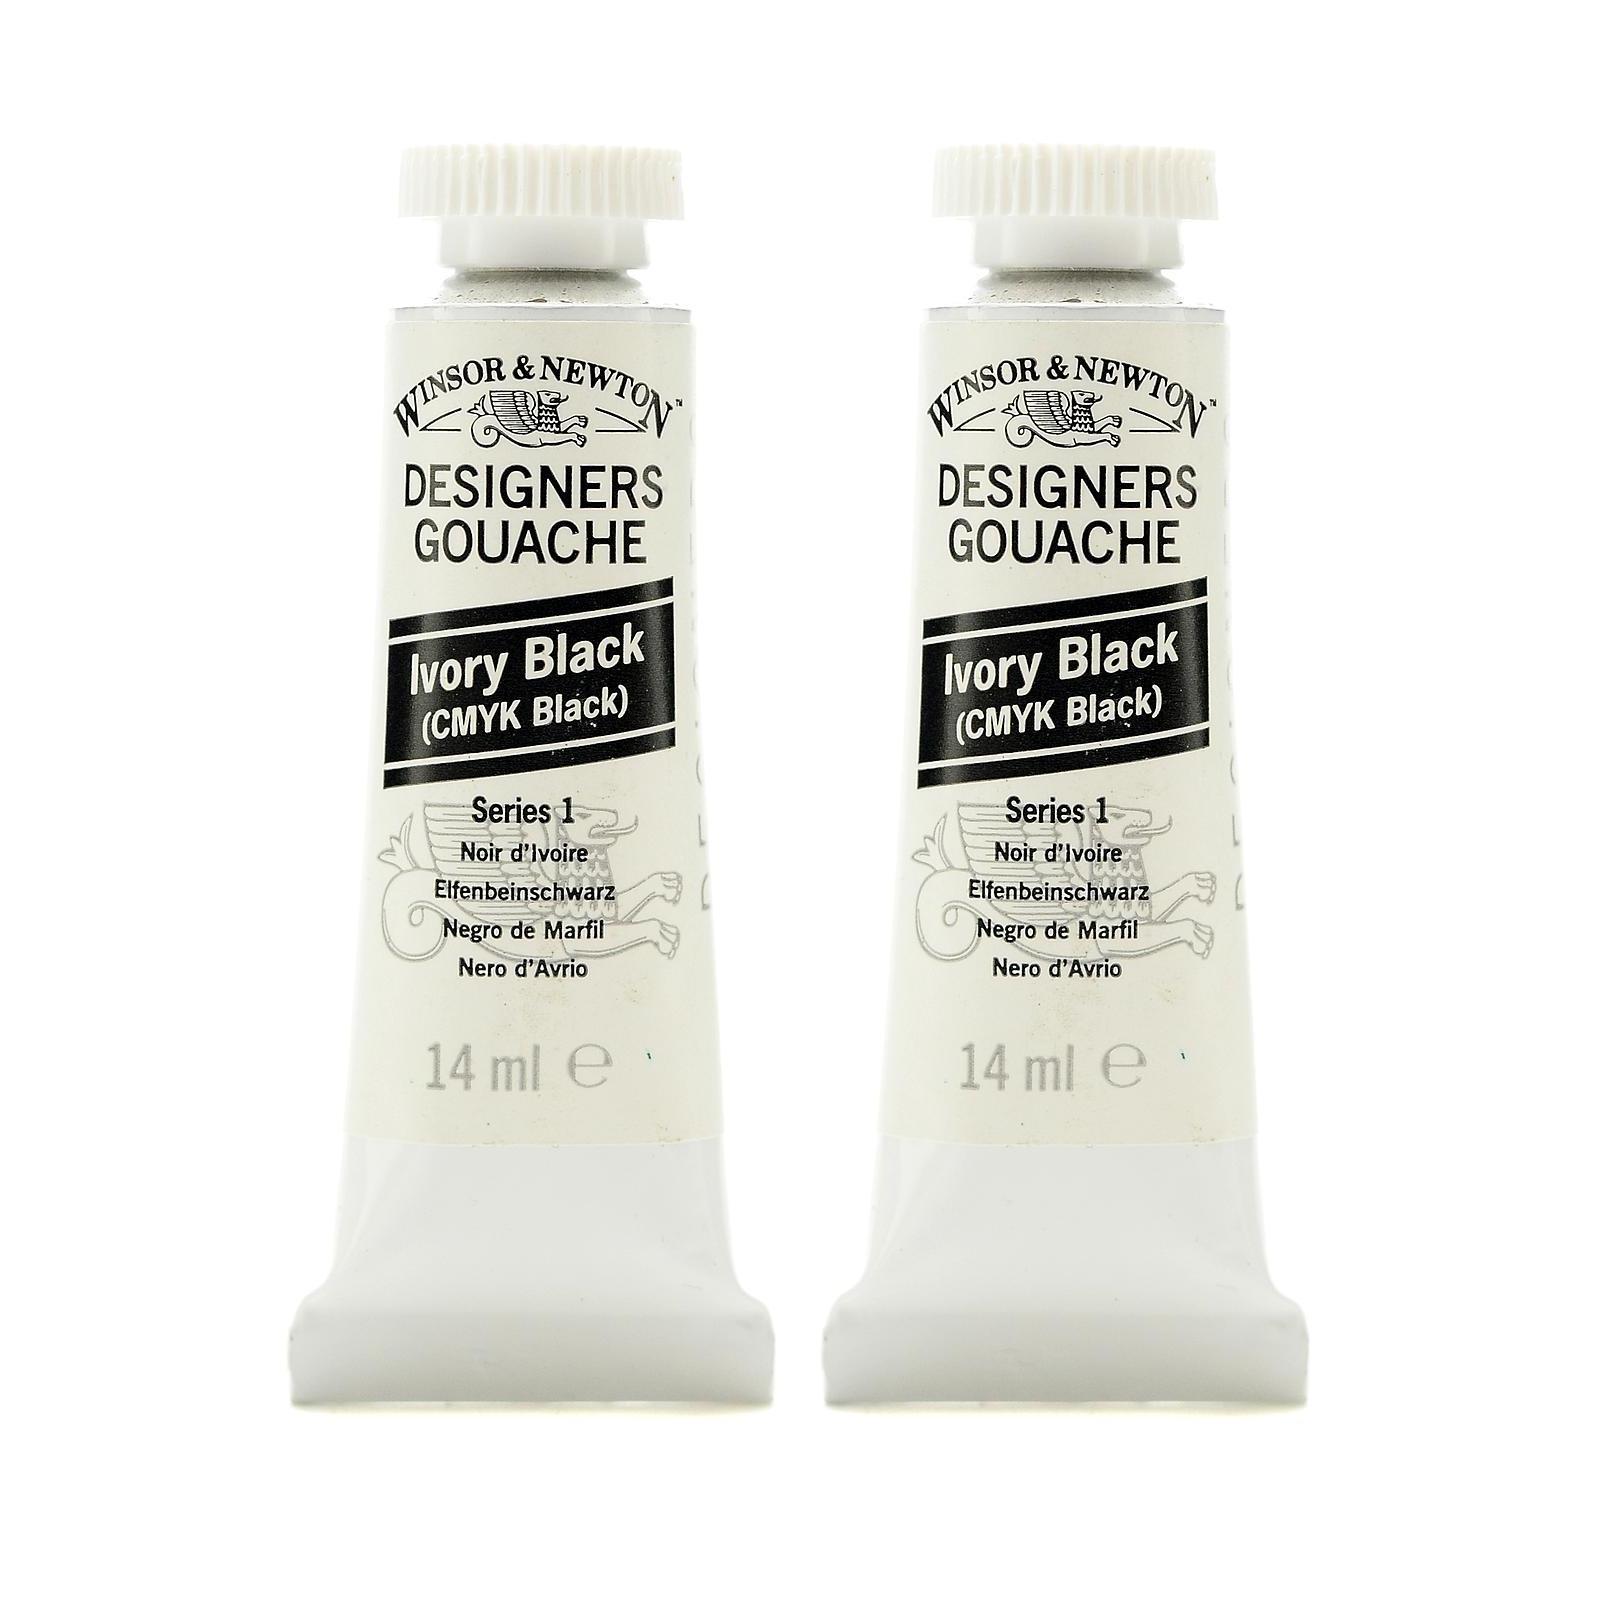 Designers' Gouache ivory black, 14 ml, 331 (pack of 2)